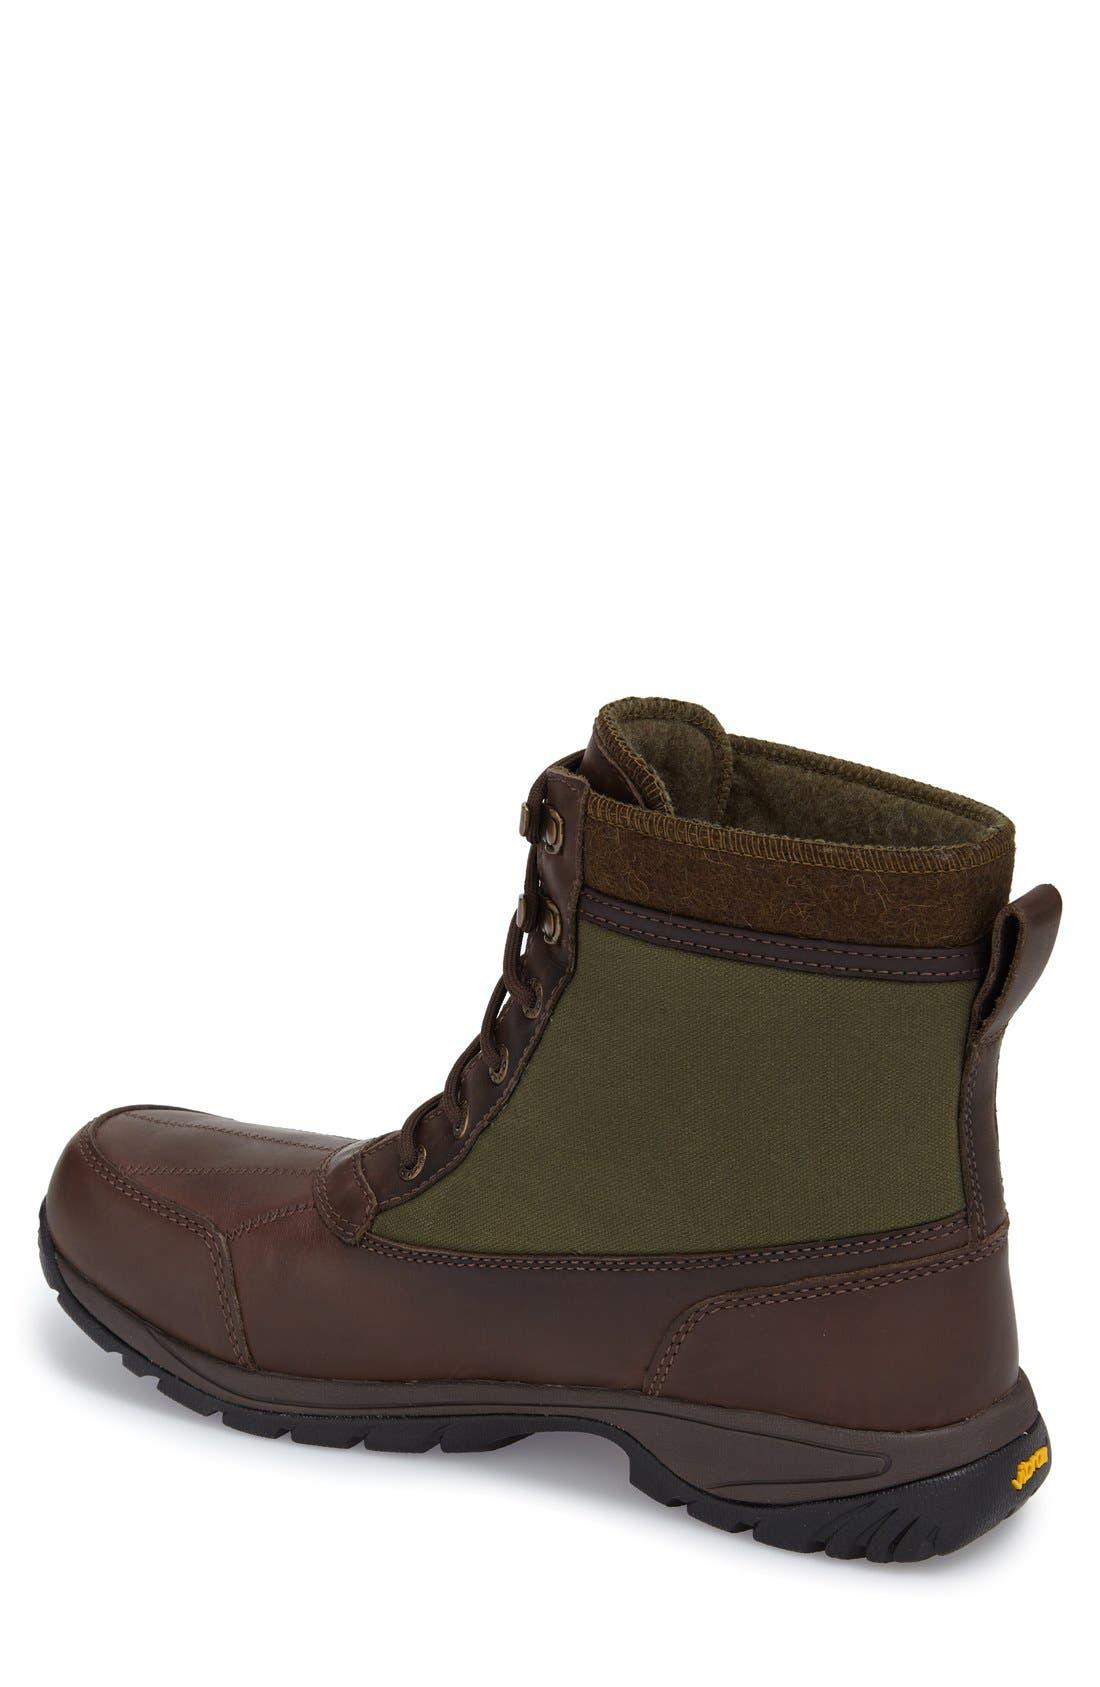 Alternate Image 2  - UGG® 'Eaglin' Waterproof Snow Boot